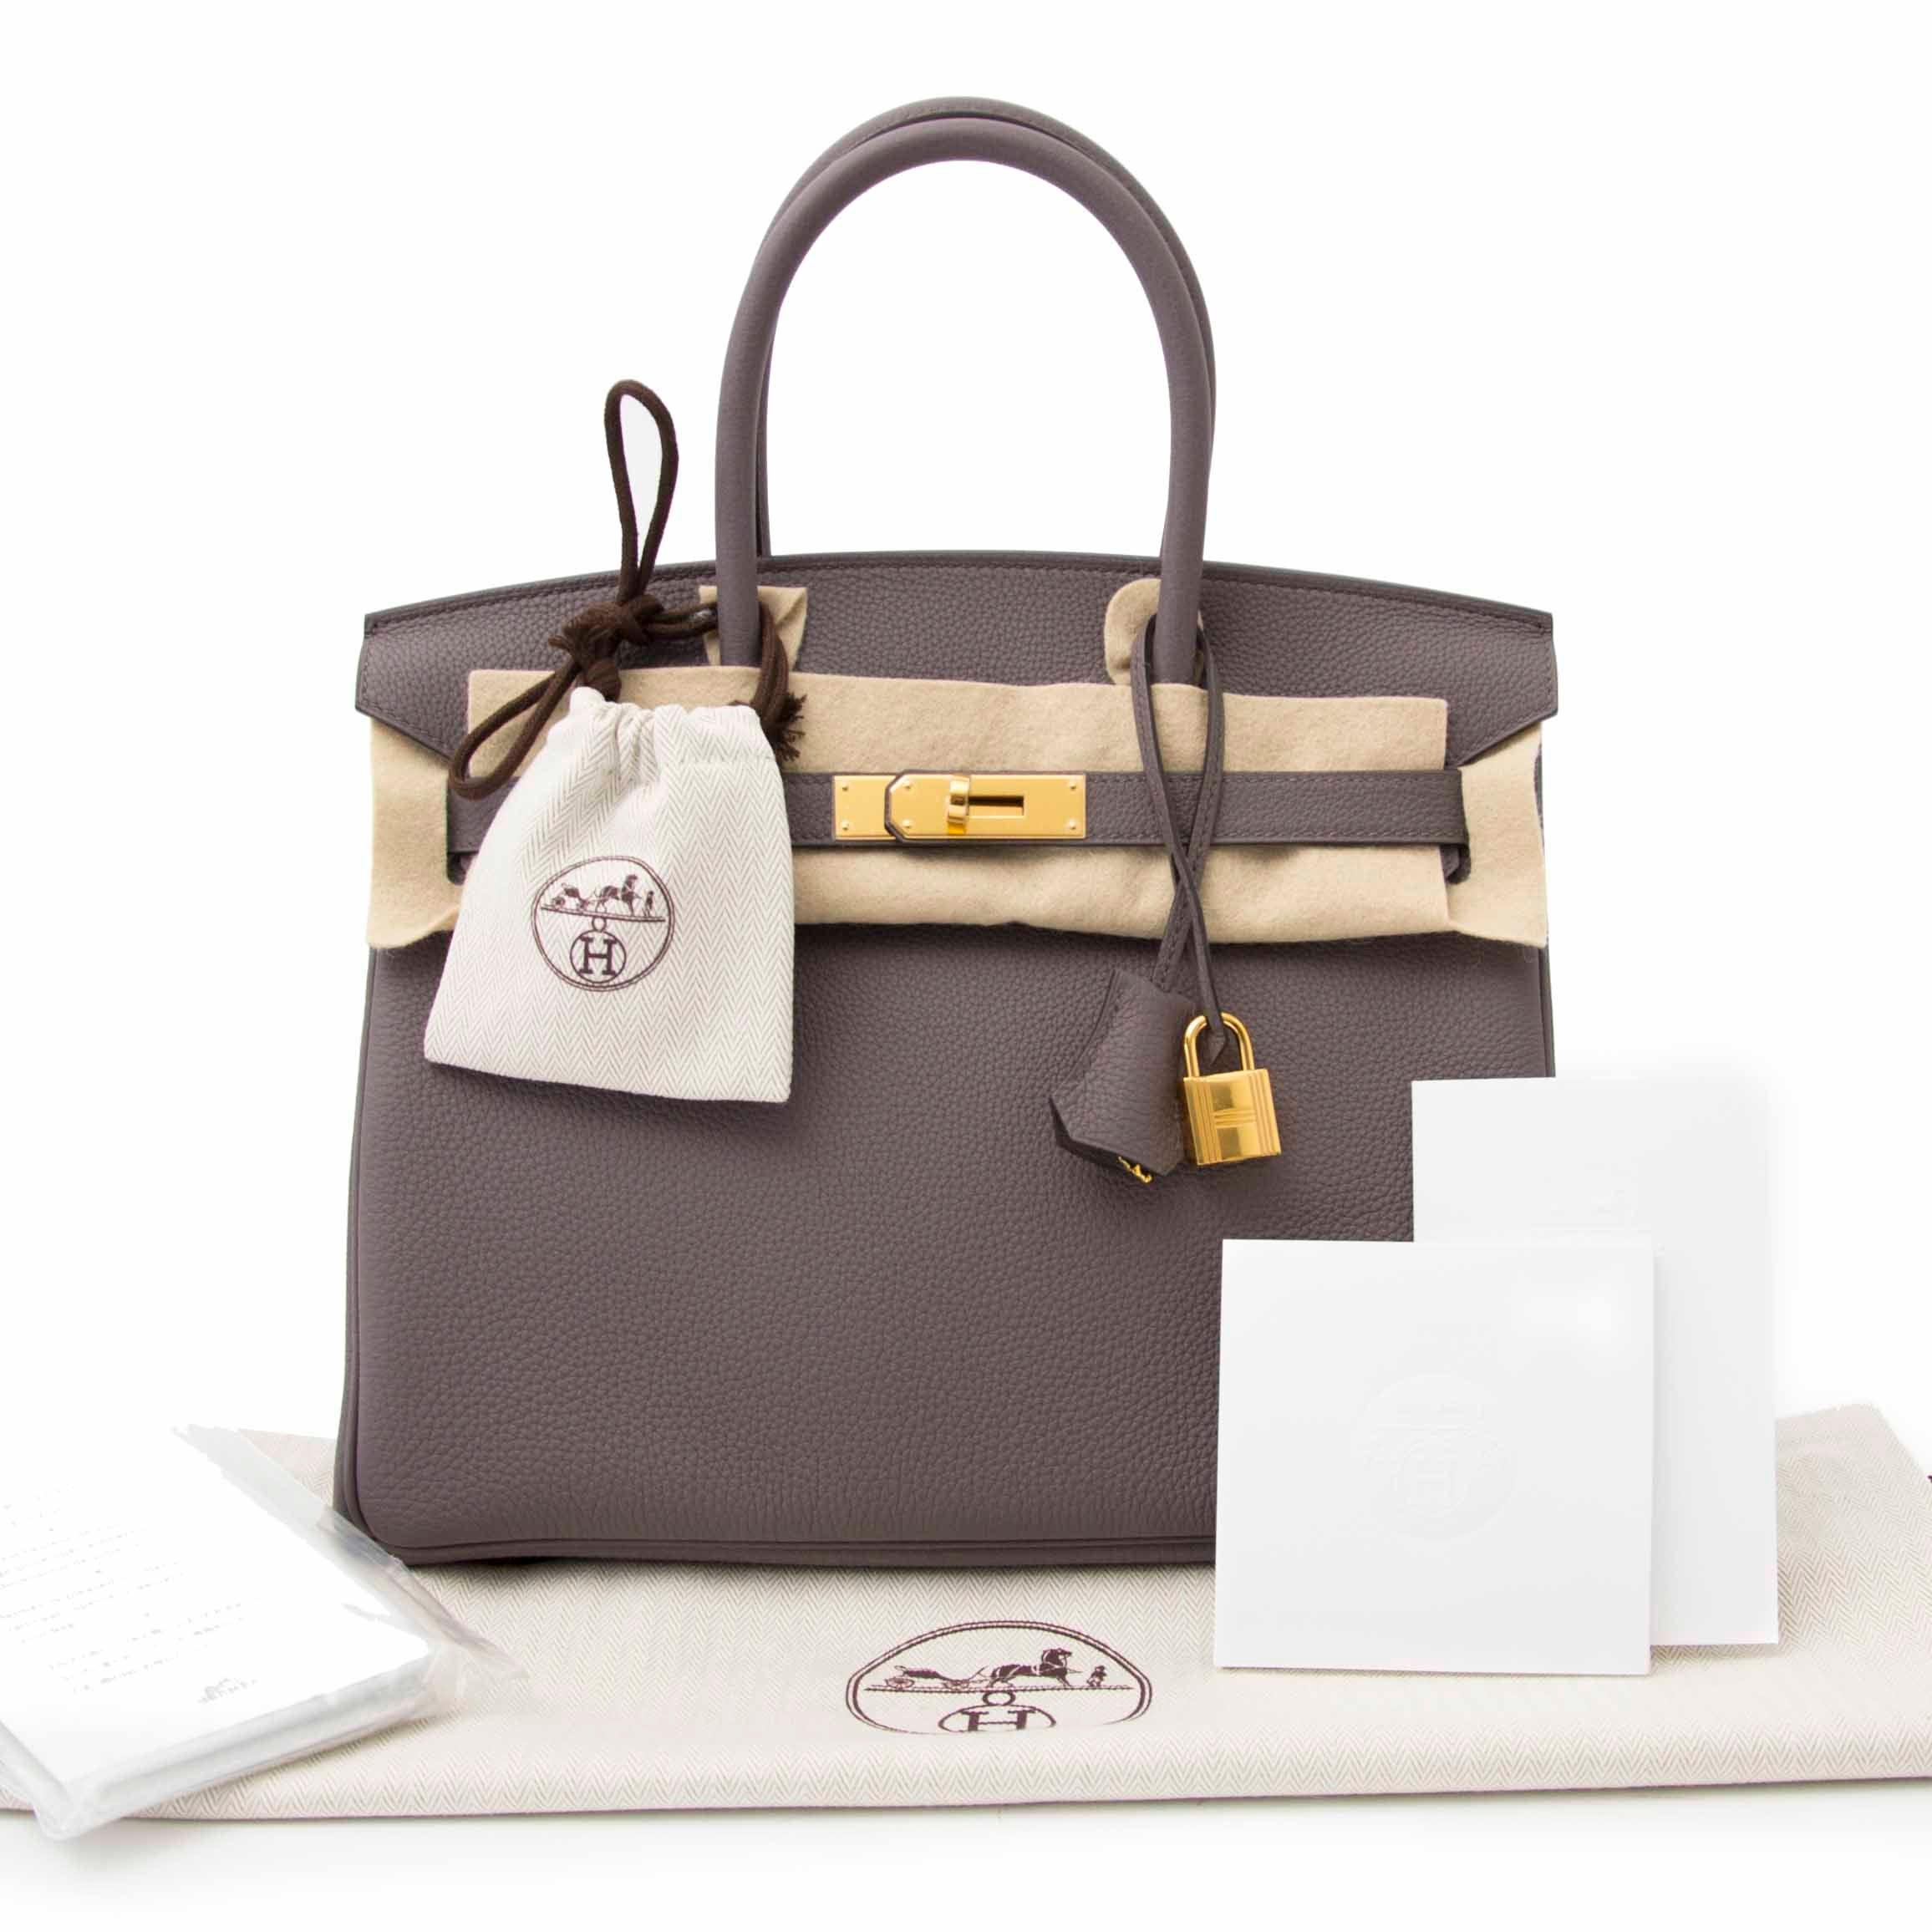 4cbdd231b57d Hermès Birkin 30 Togo Etain GHW